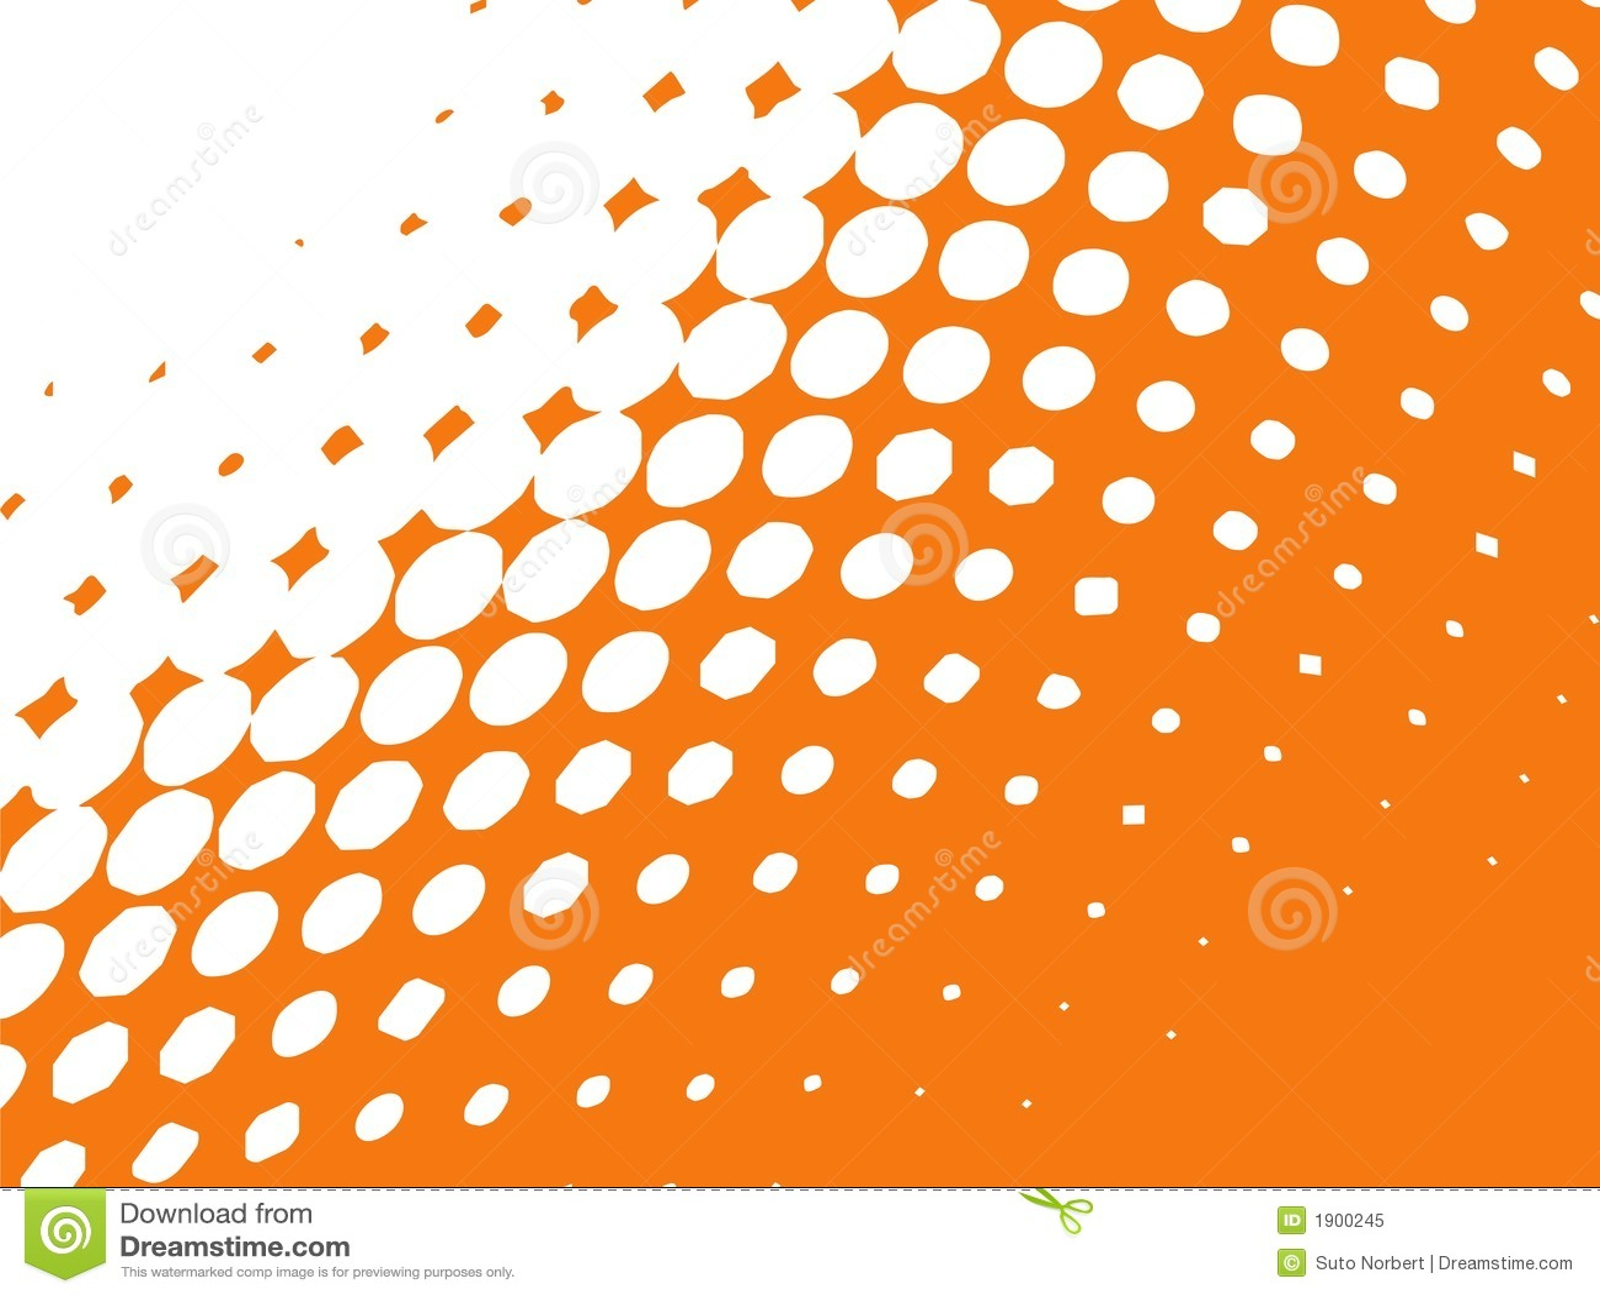 Halftone Logo Design